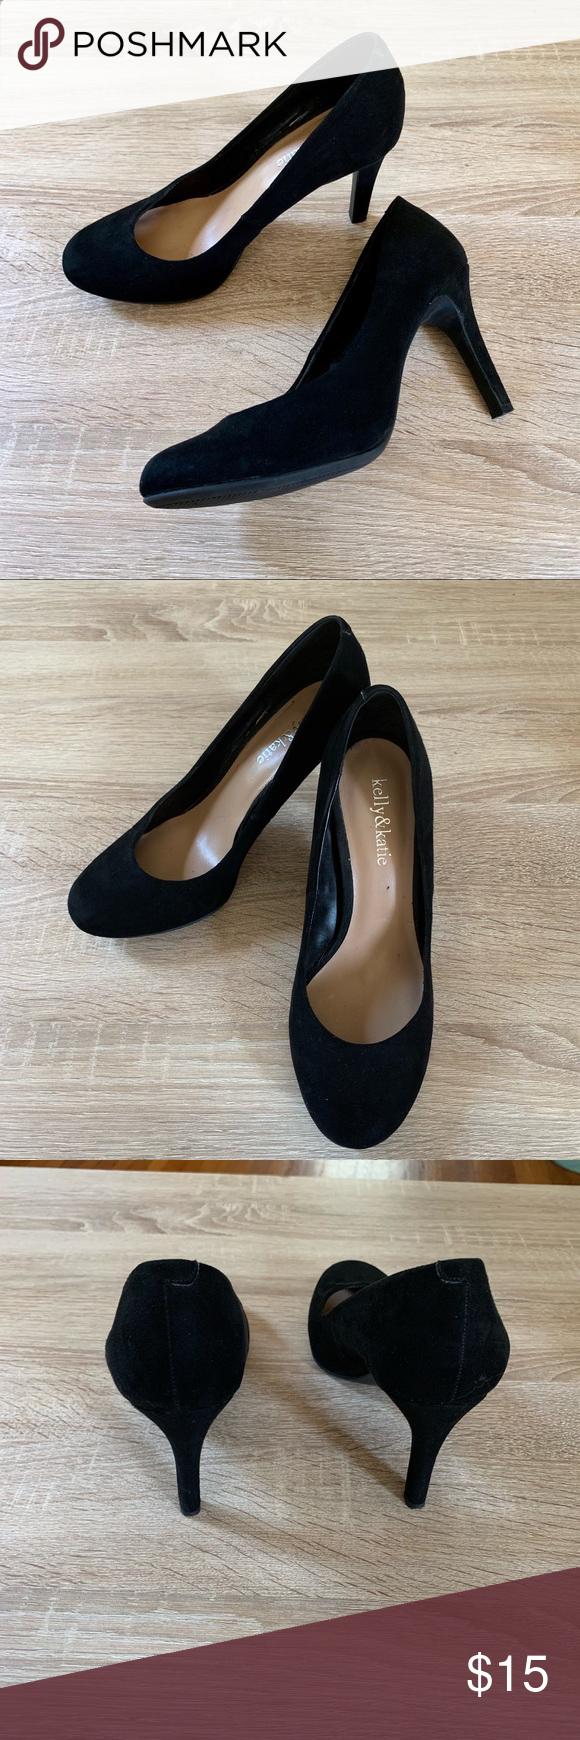 Kelly Katie Kitten Heels Round Toe Black 7 5 Shoes Women Heels Heels Work Heels